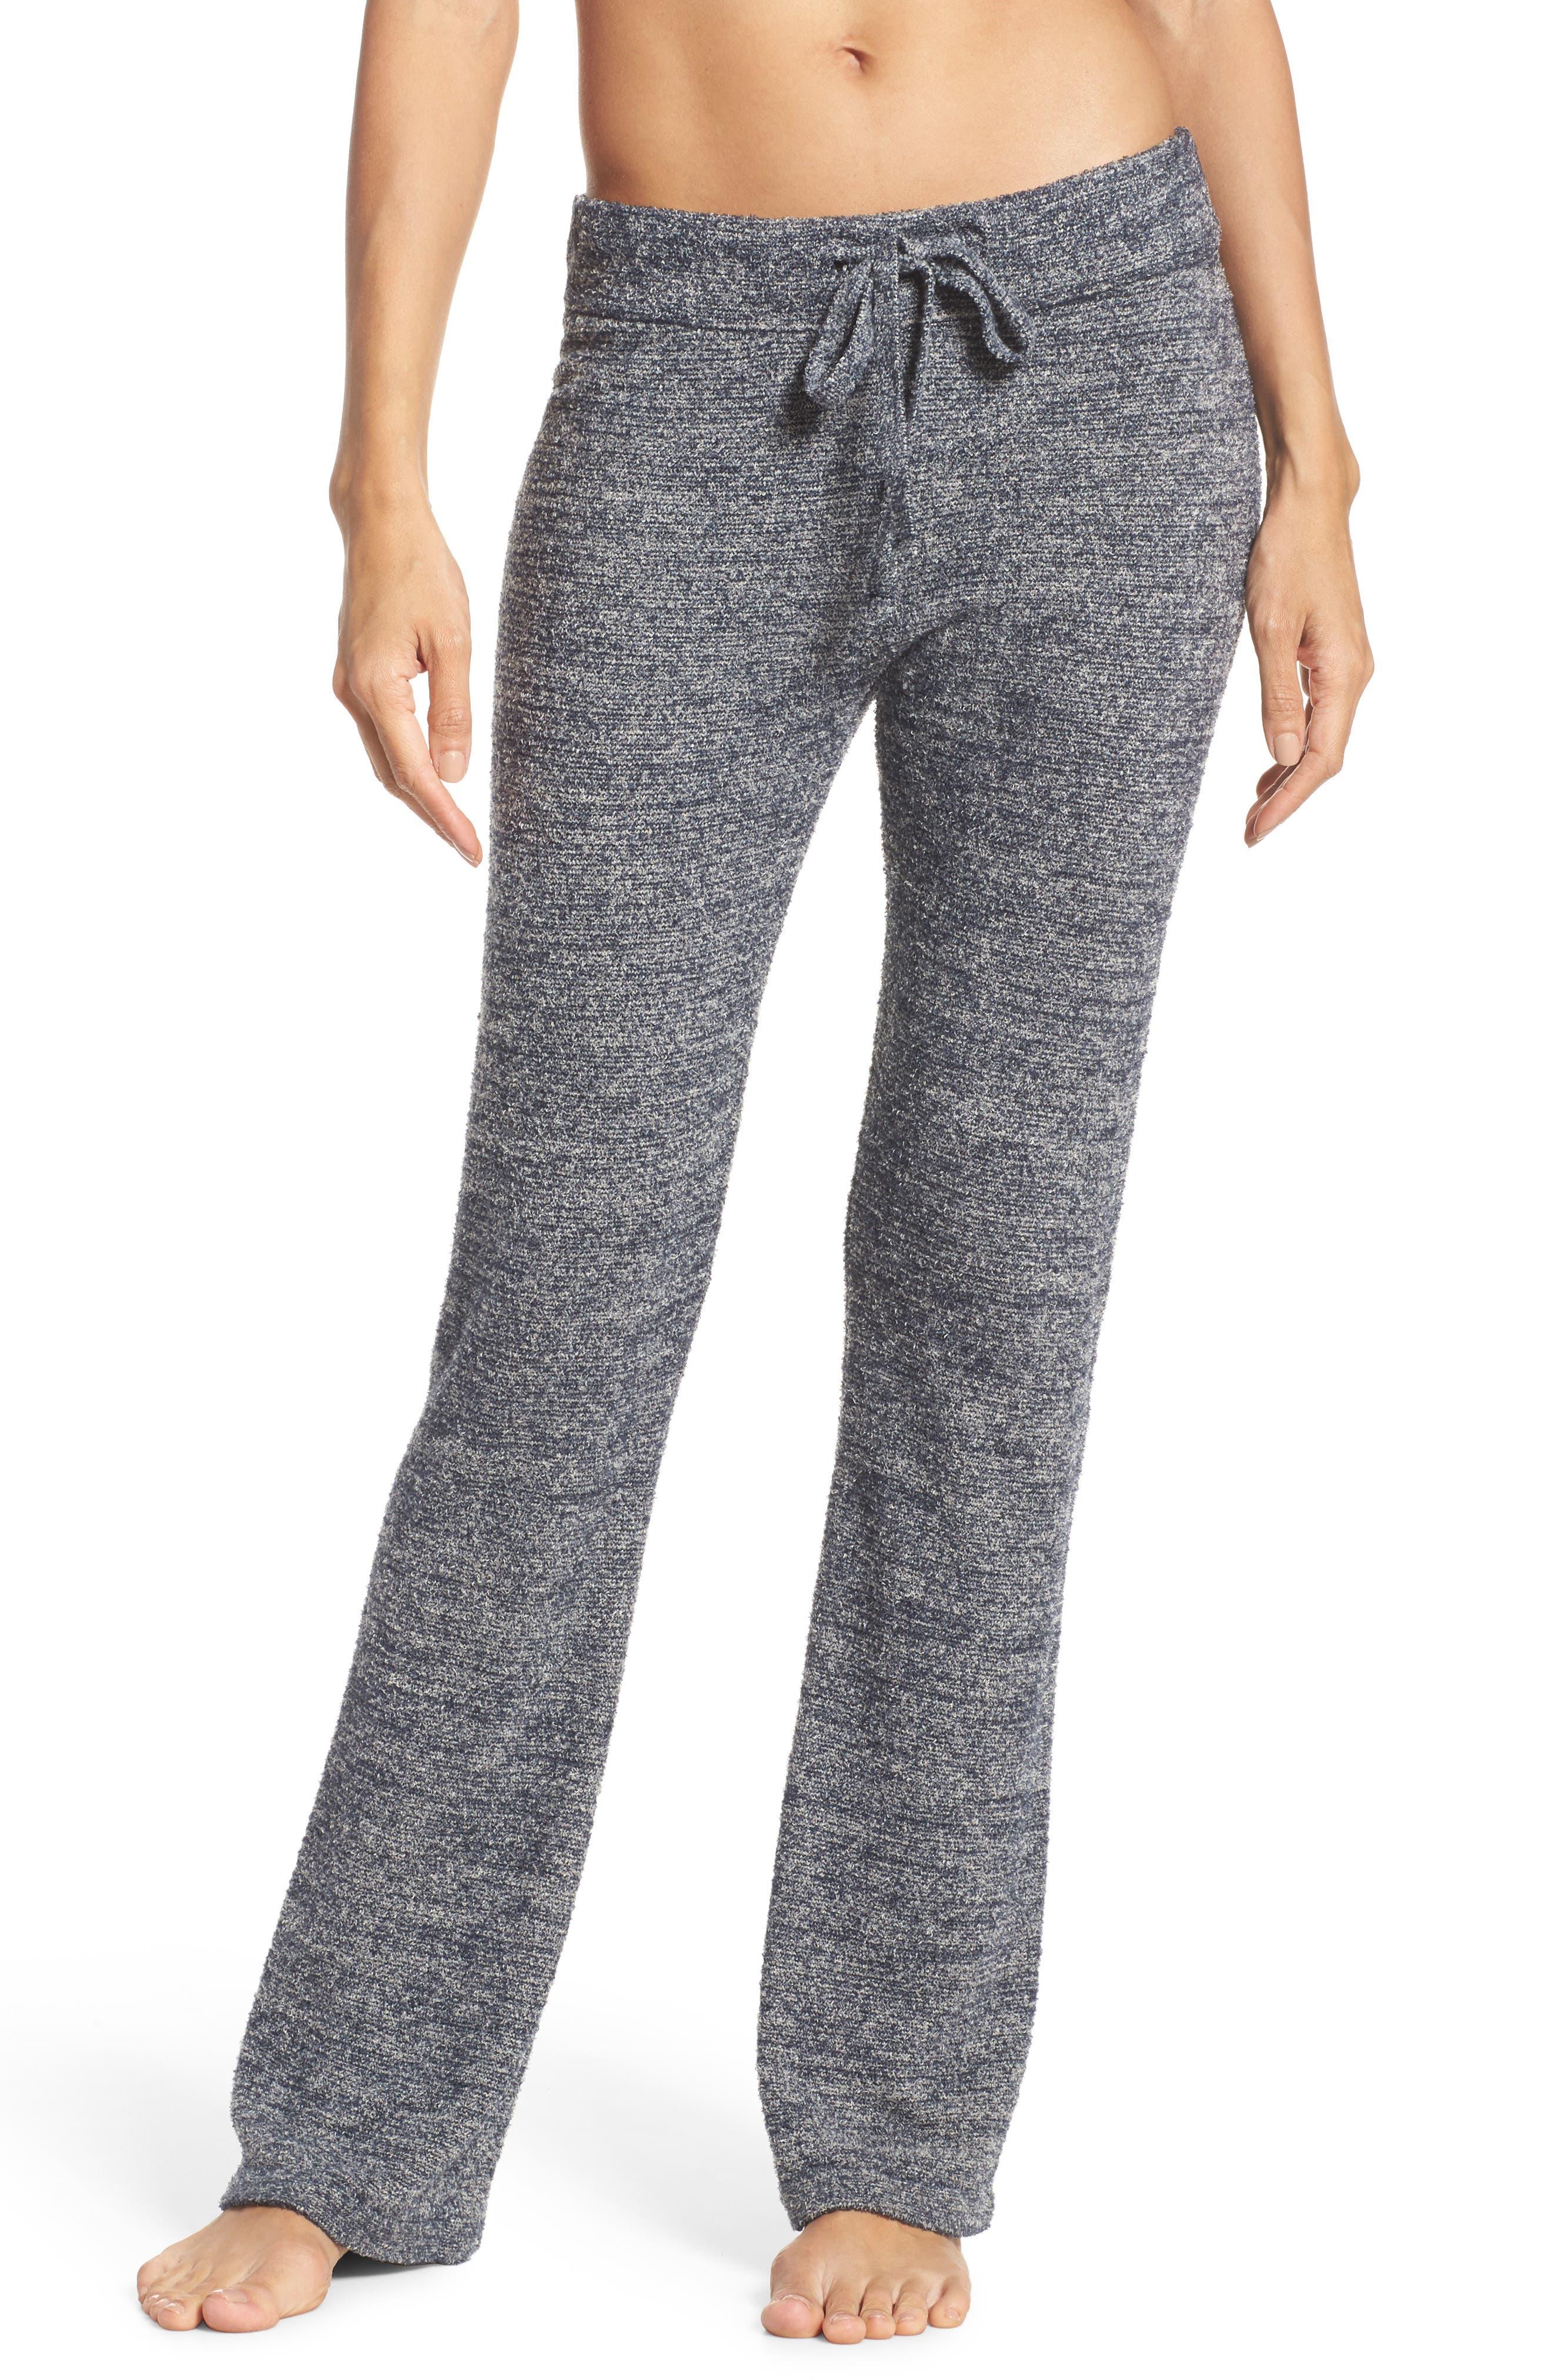 Cozychic Lite<sup>®</sup> Lounge Pants,                         Main,                         color, Indigo/ Stone He